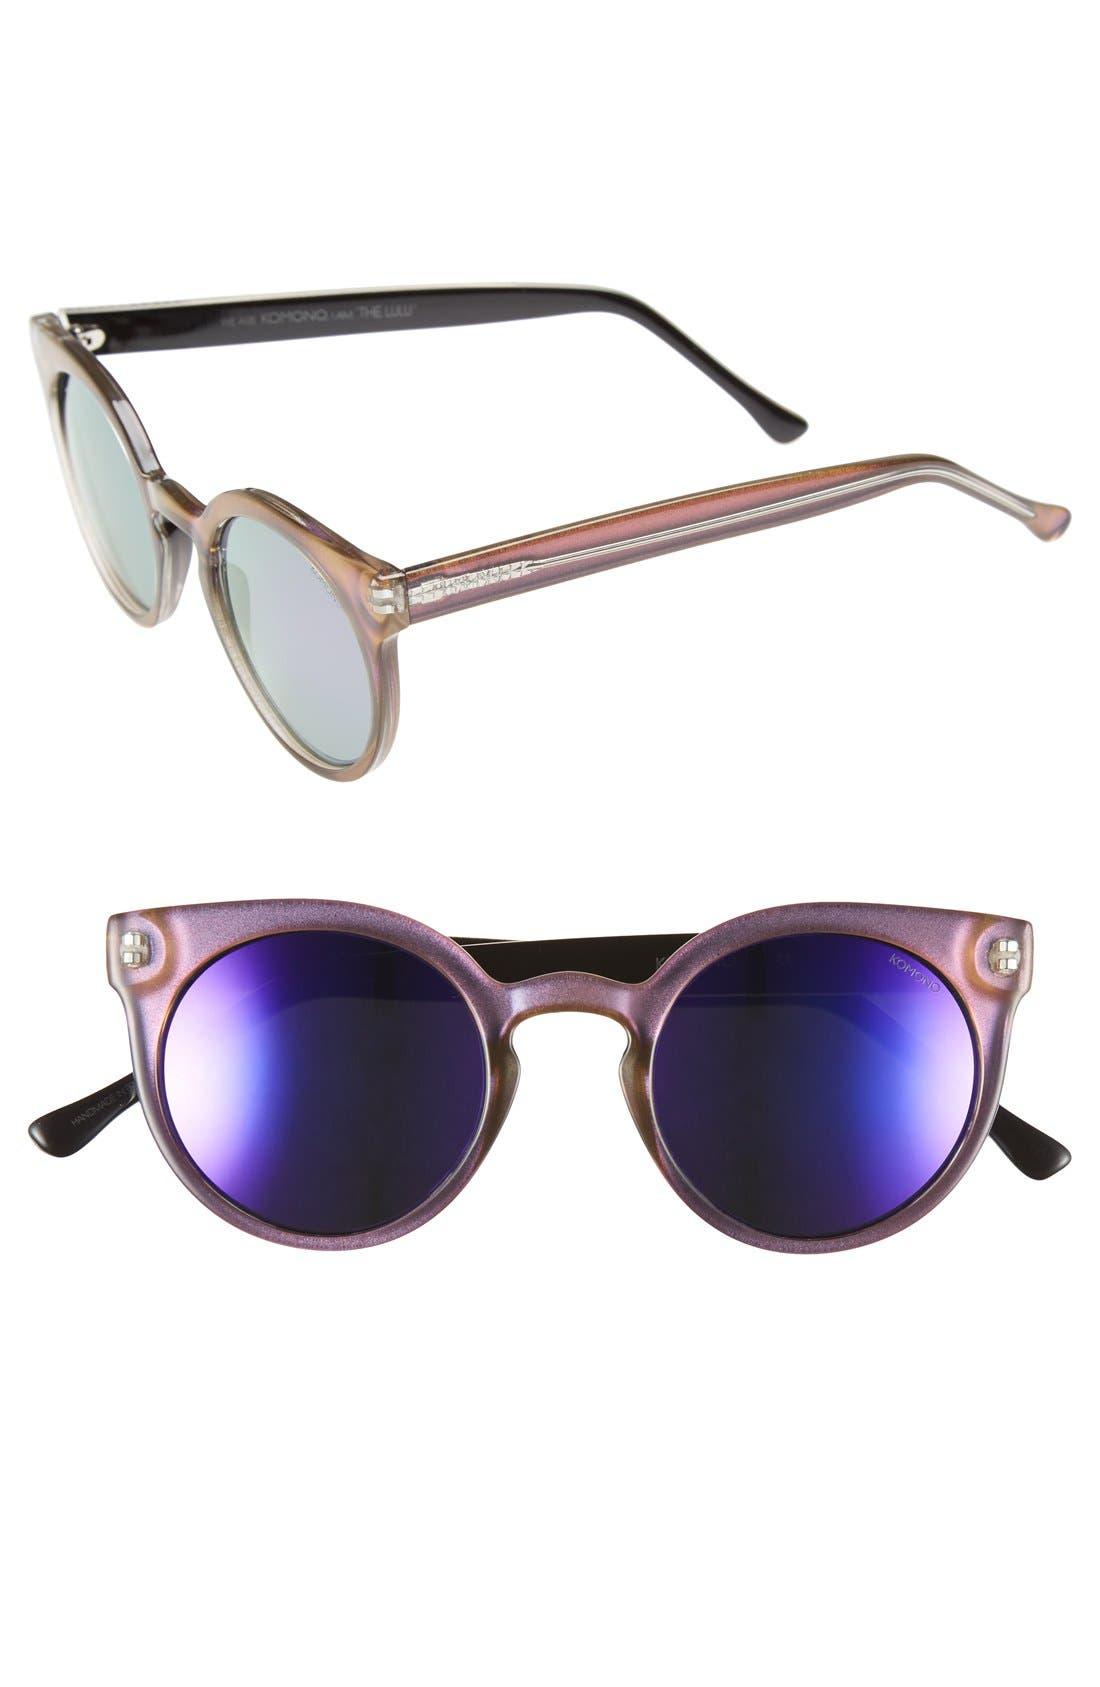 Main Image - Komono 'Lulu' Round Lens Sunglasses